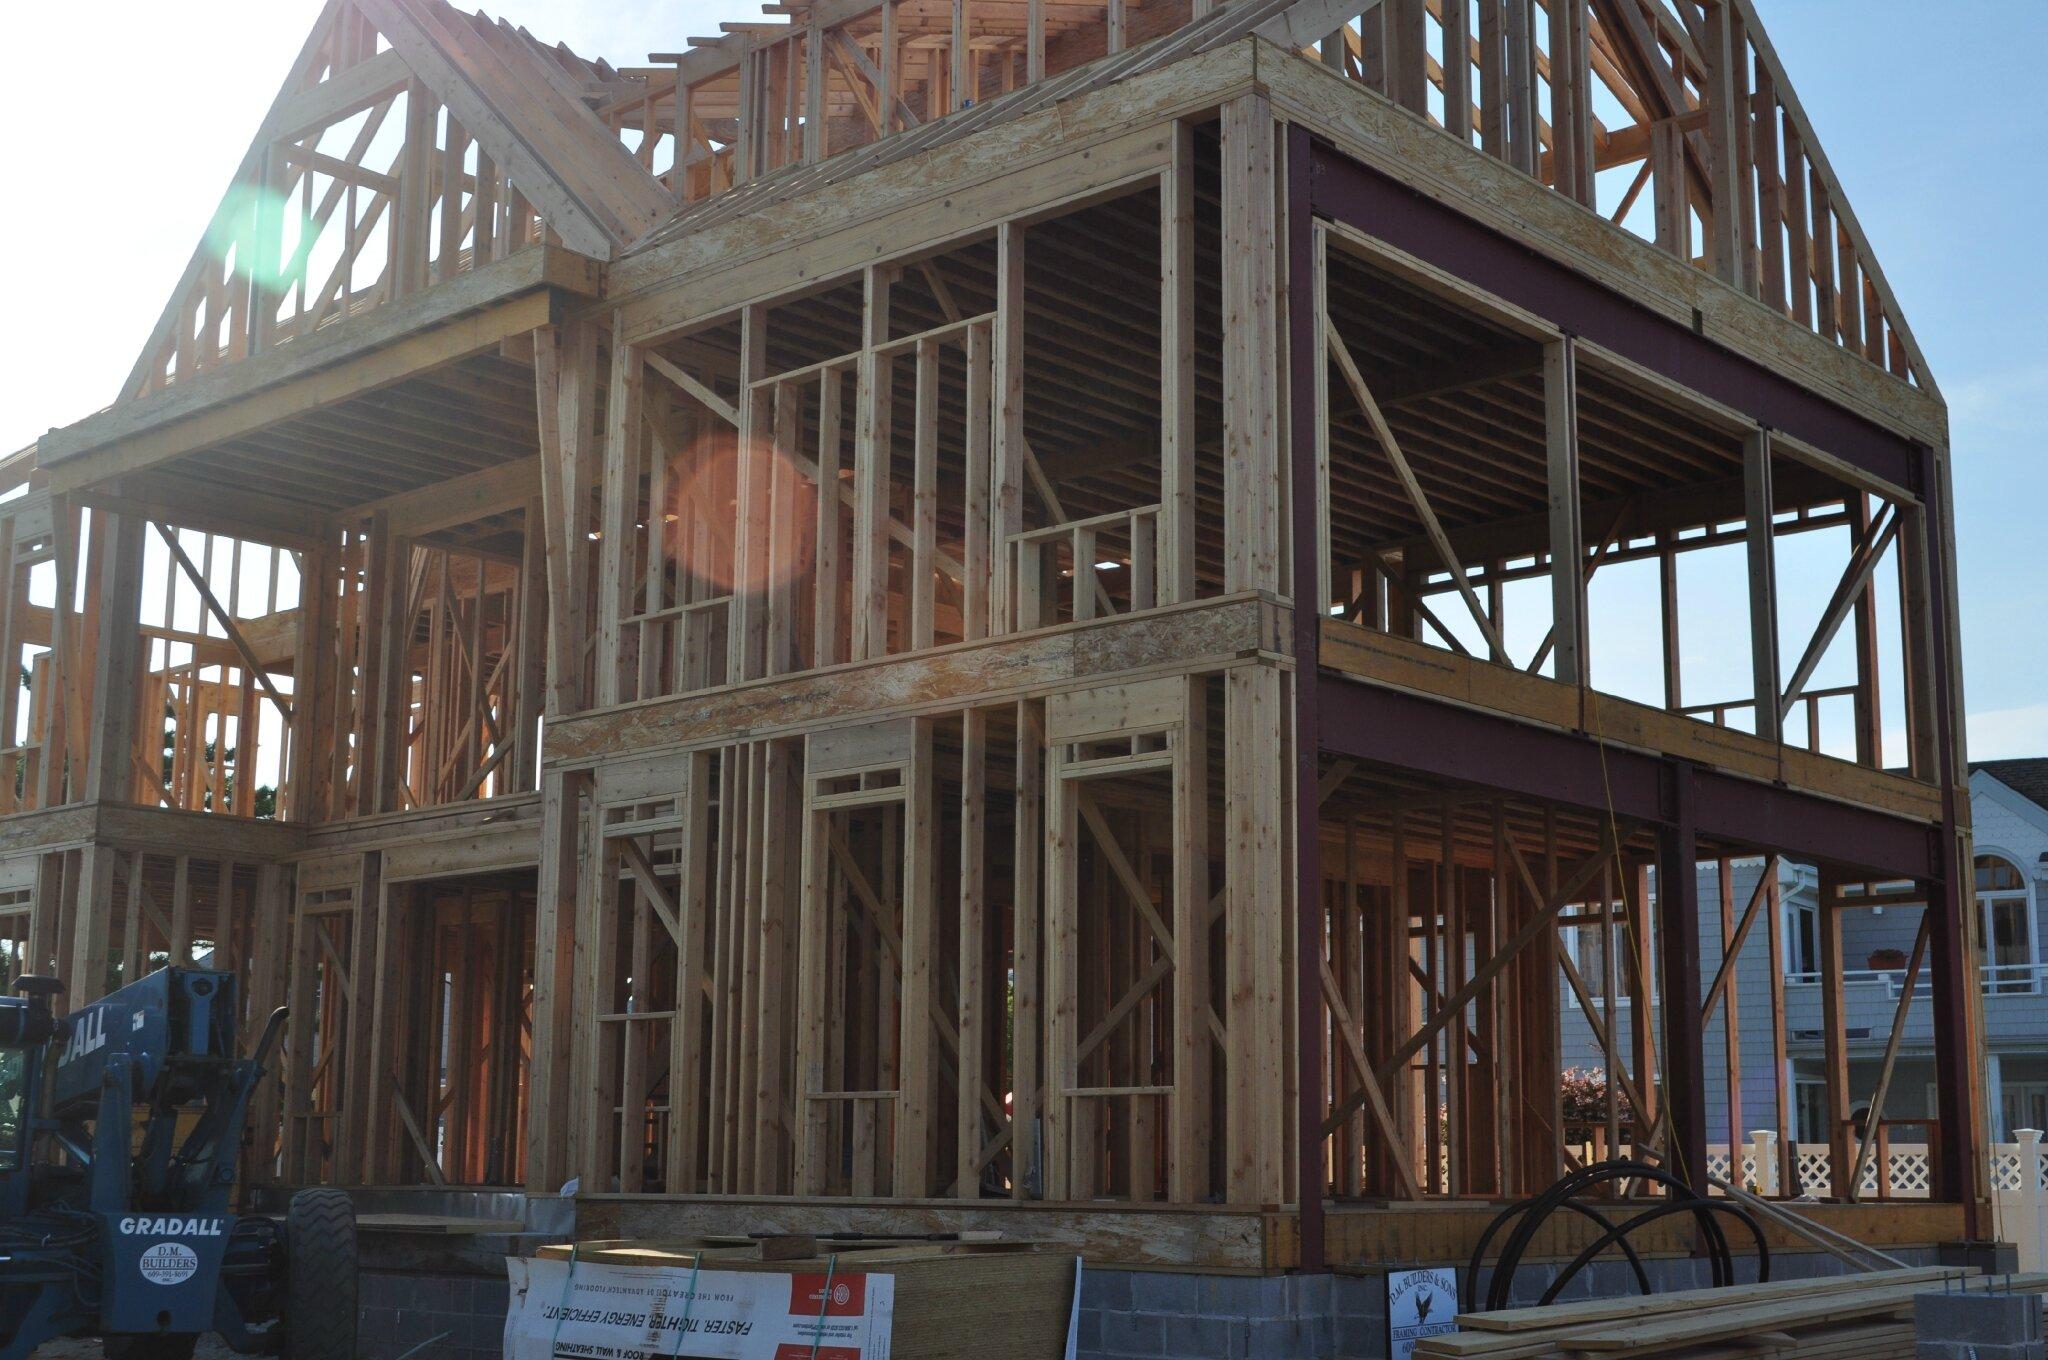 Construction maison americaine ventana blog - Maison bois americaine ...